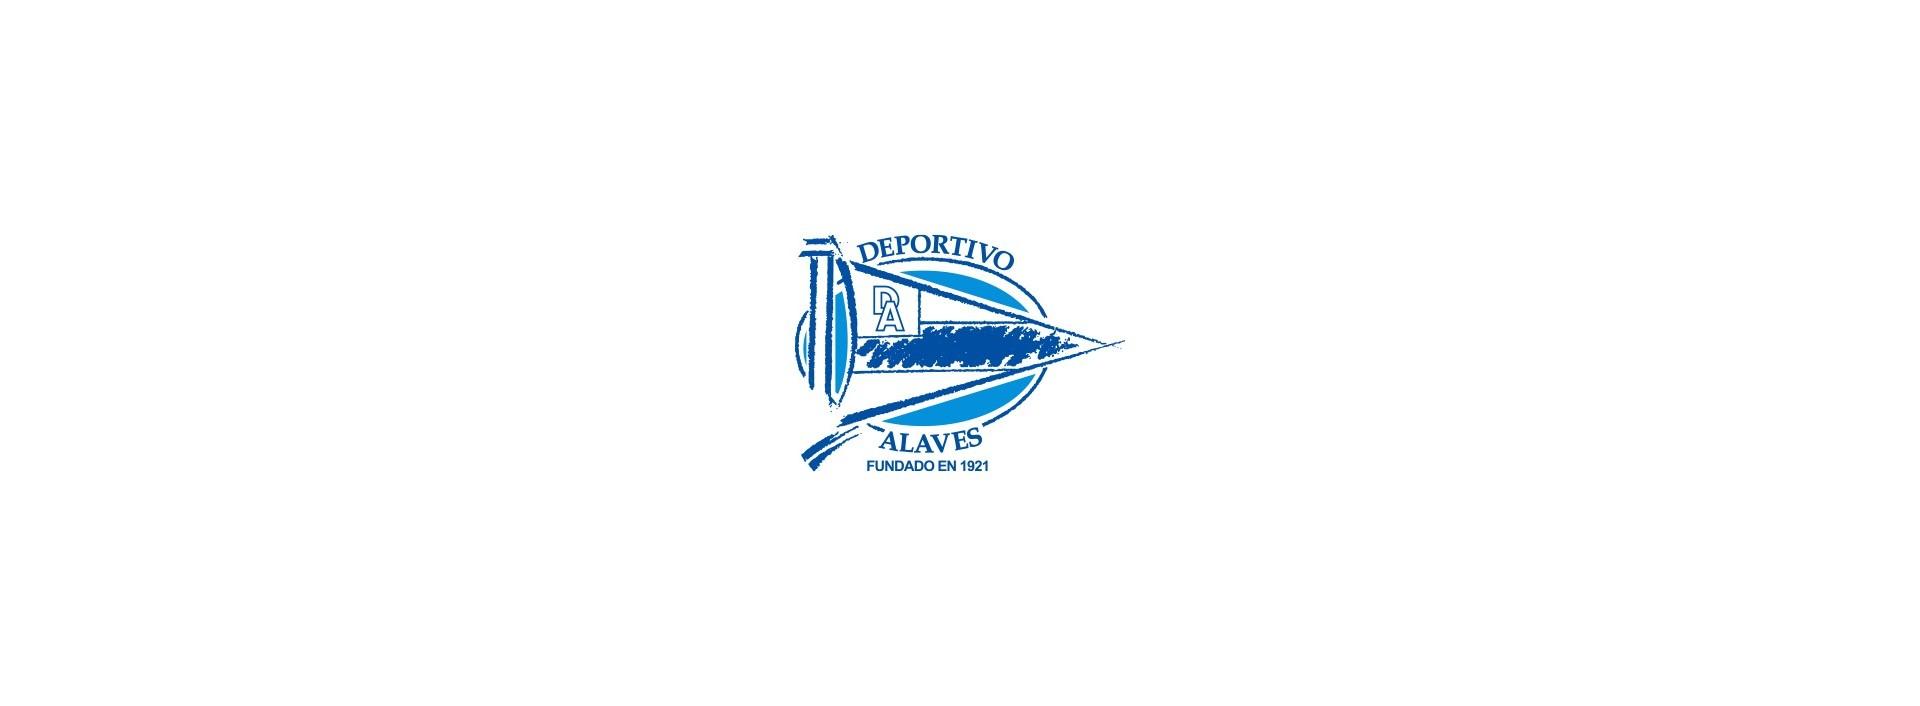 D. ALAVES